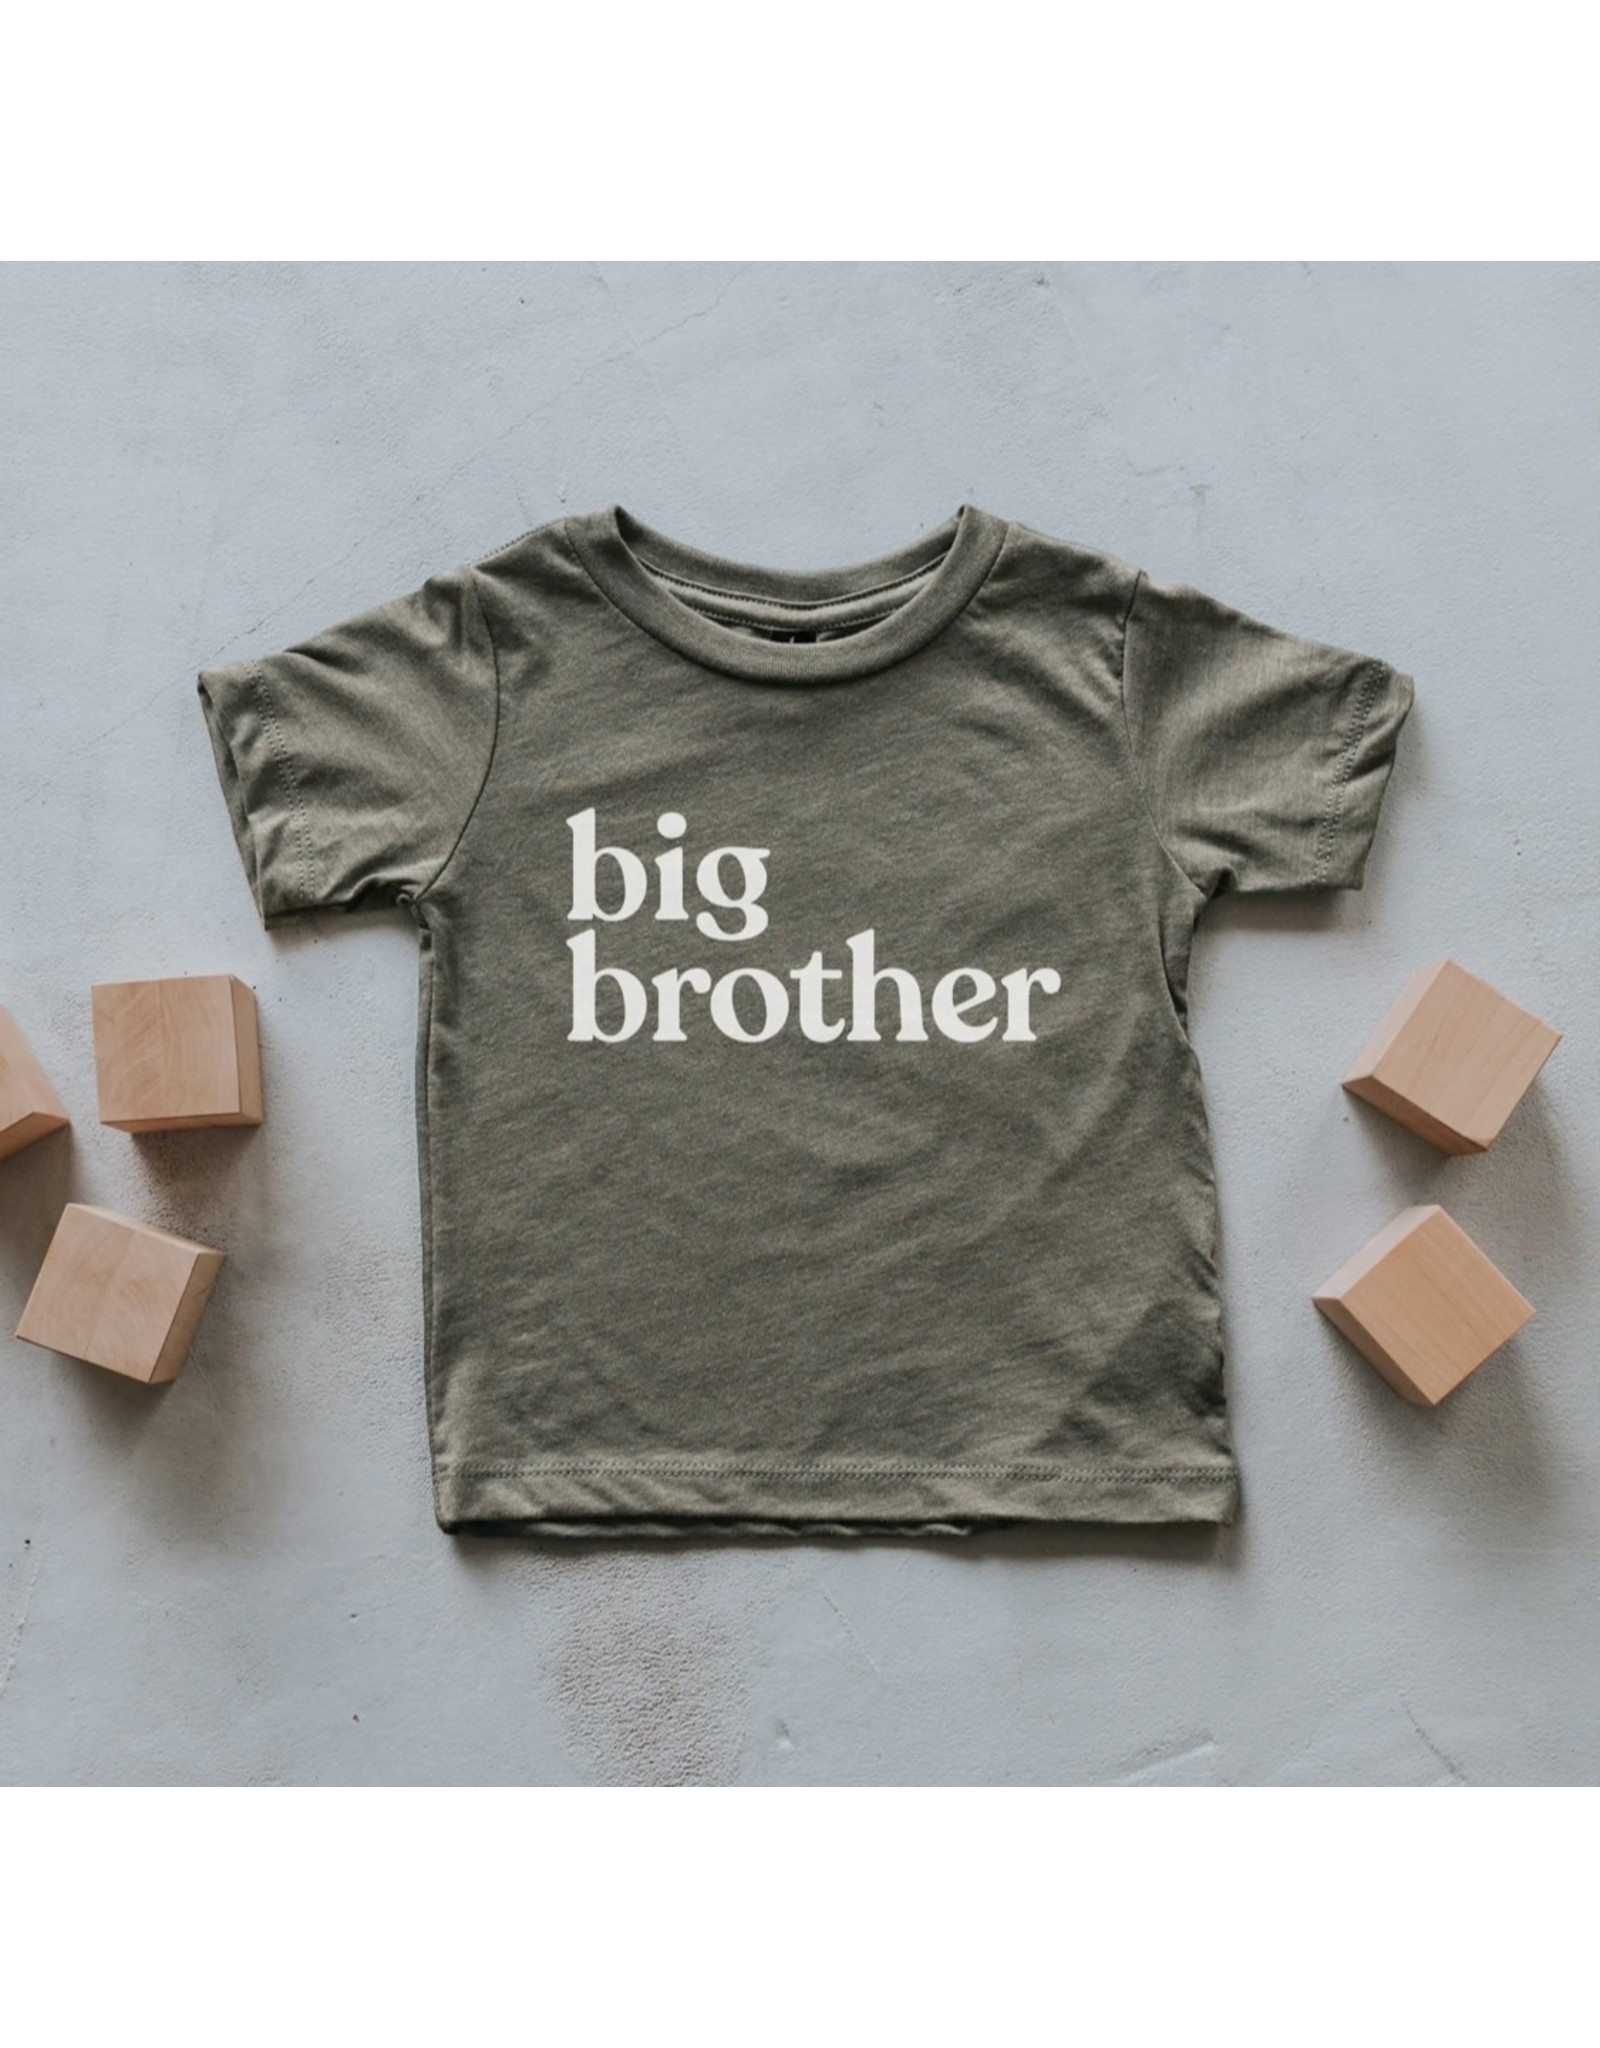 Gladfolk Gladfolk- Olive Big Brother Tee